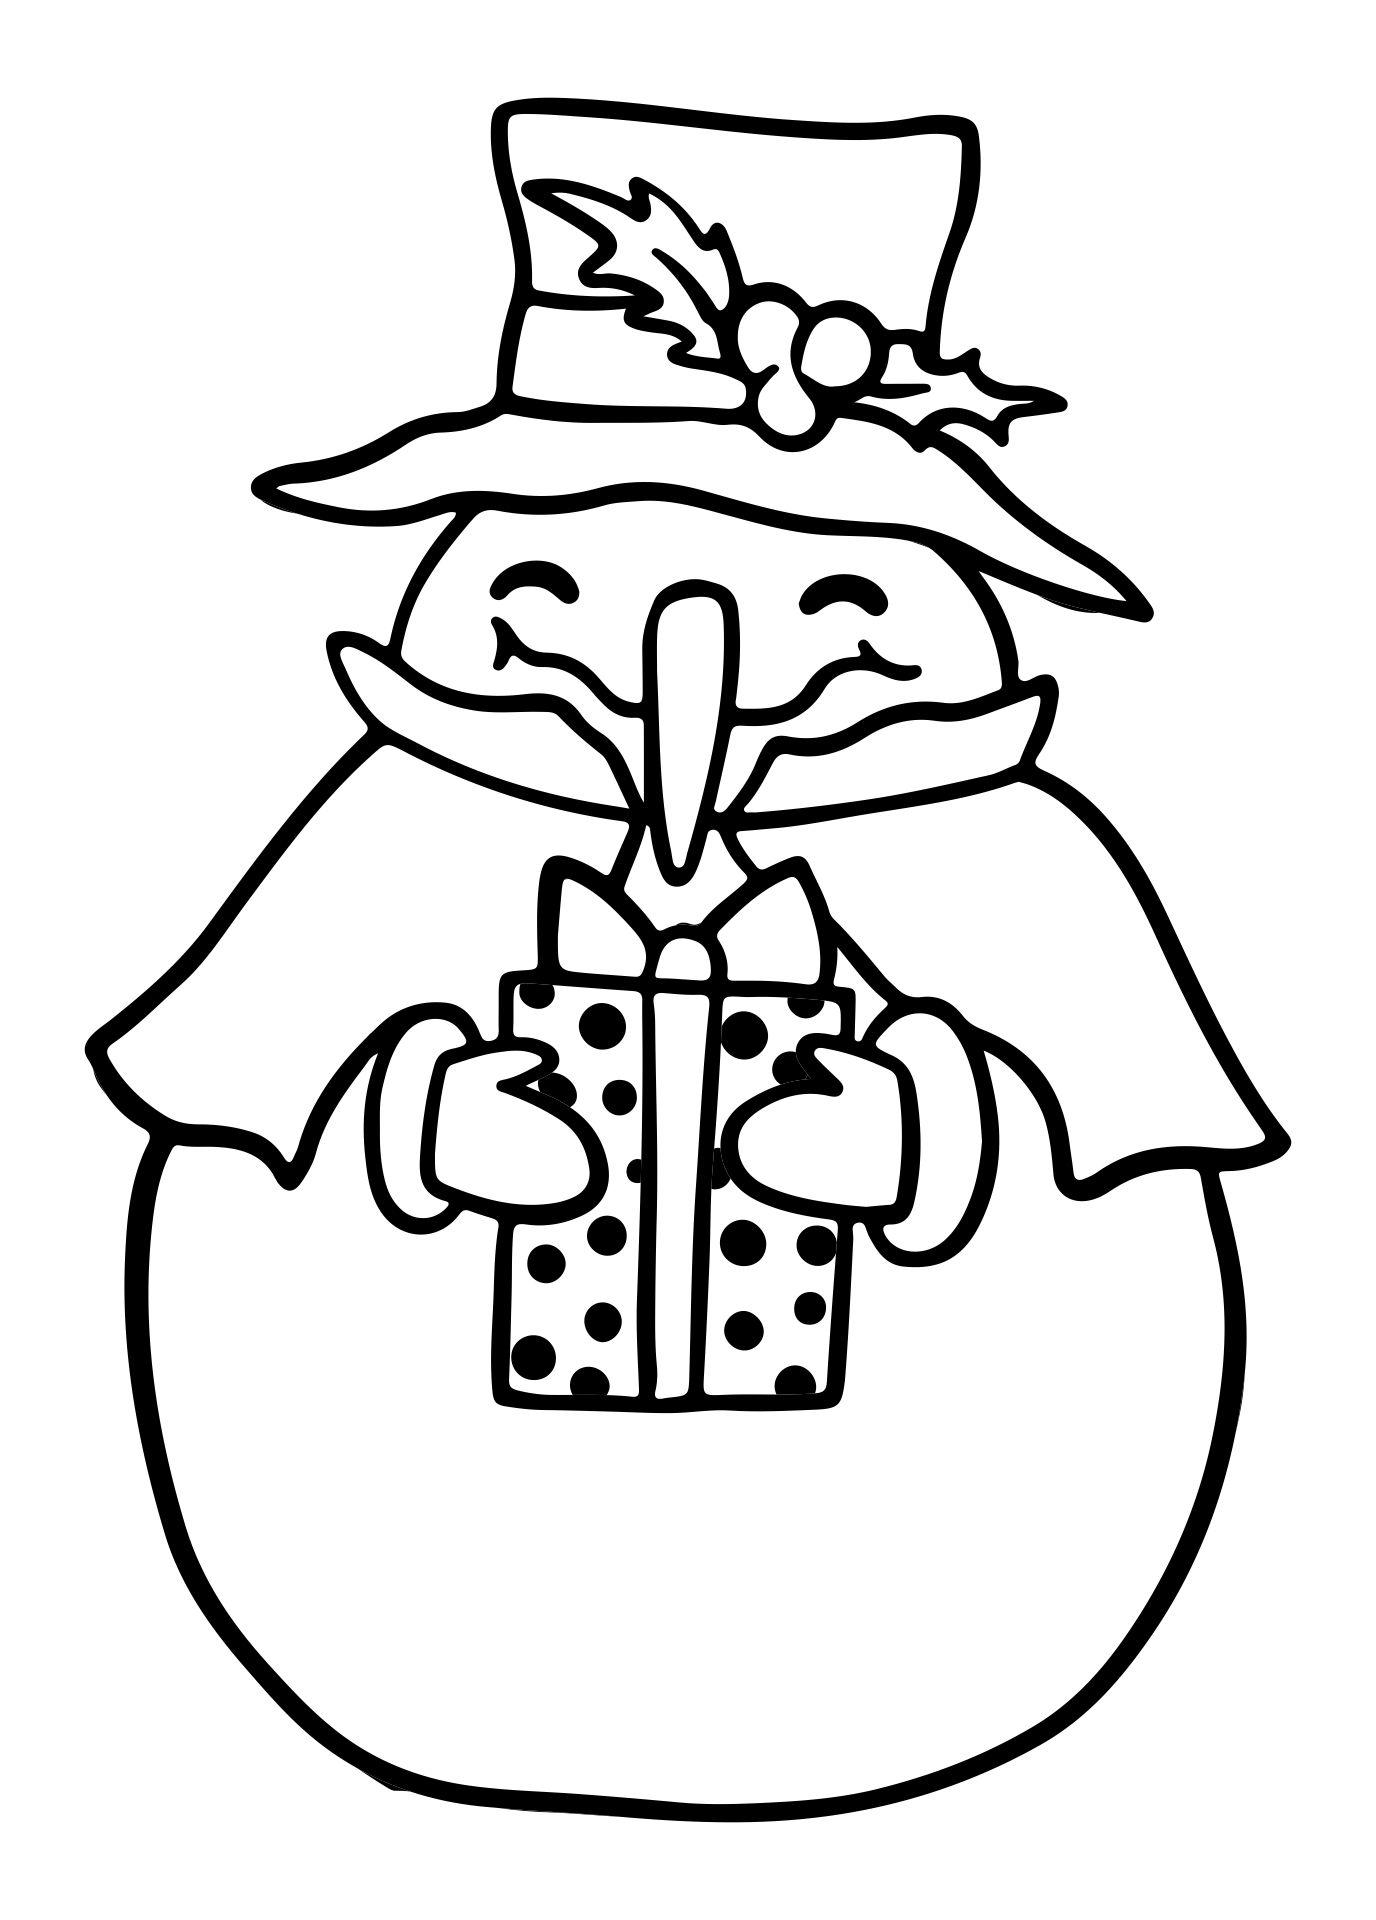 5 Images of Printable Christmas Snowman